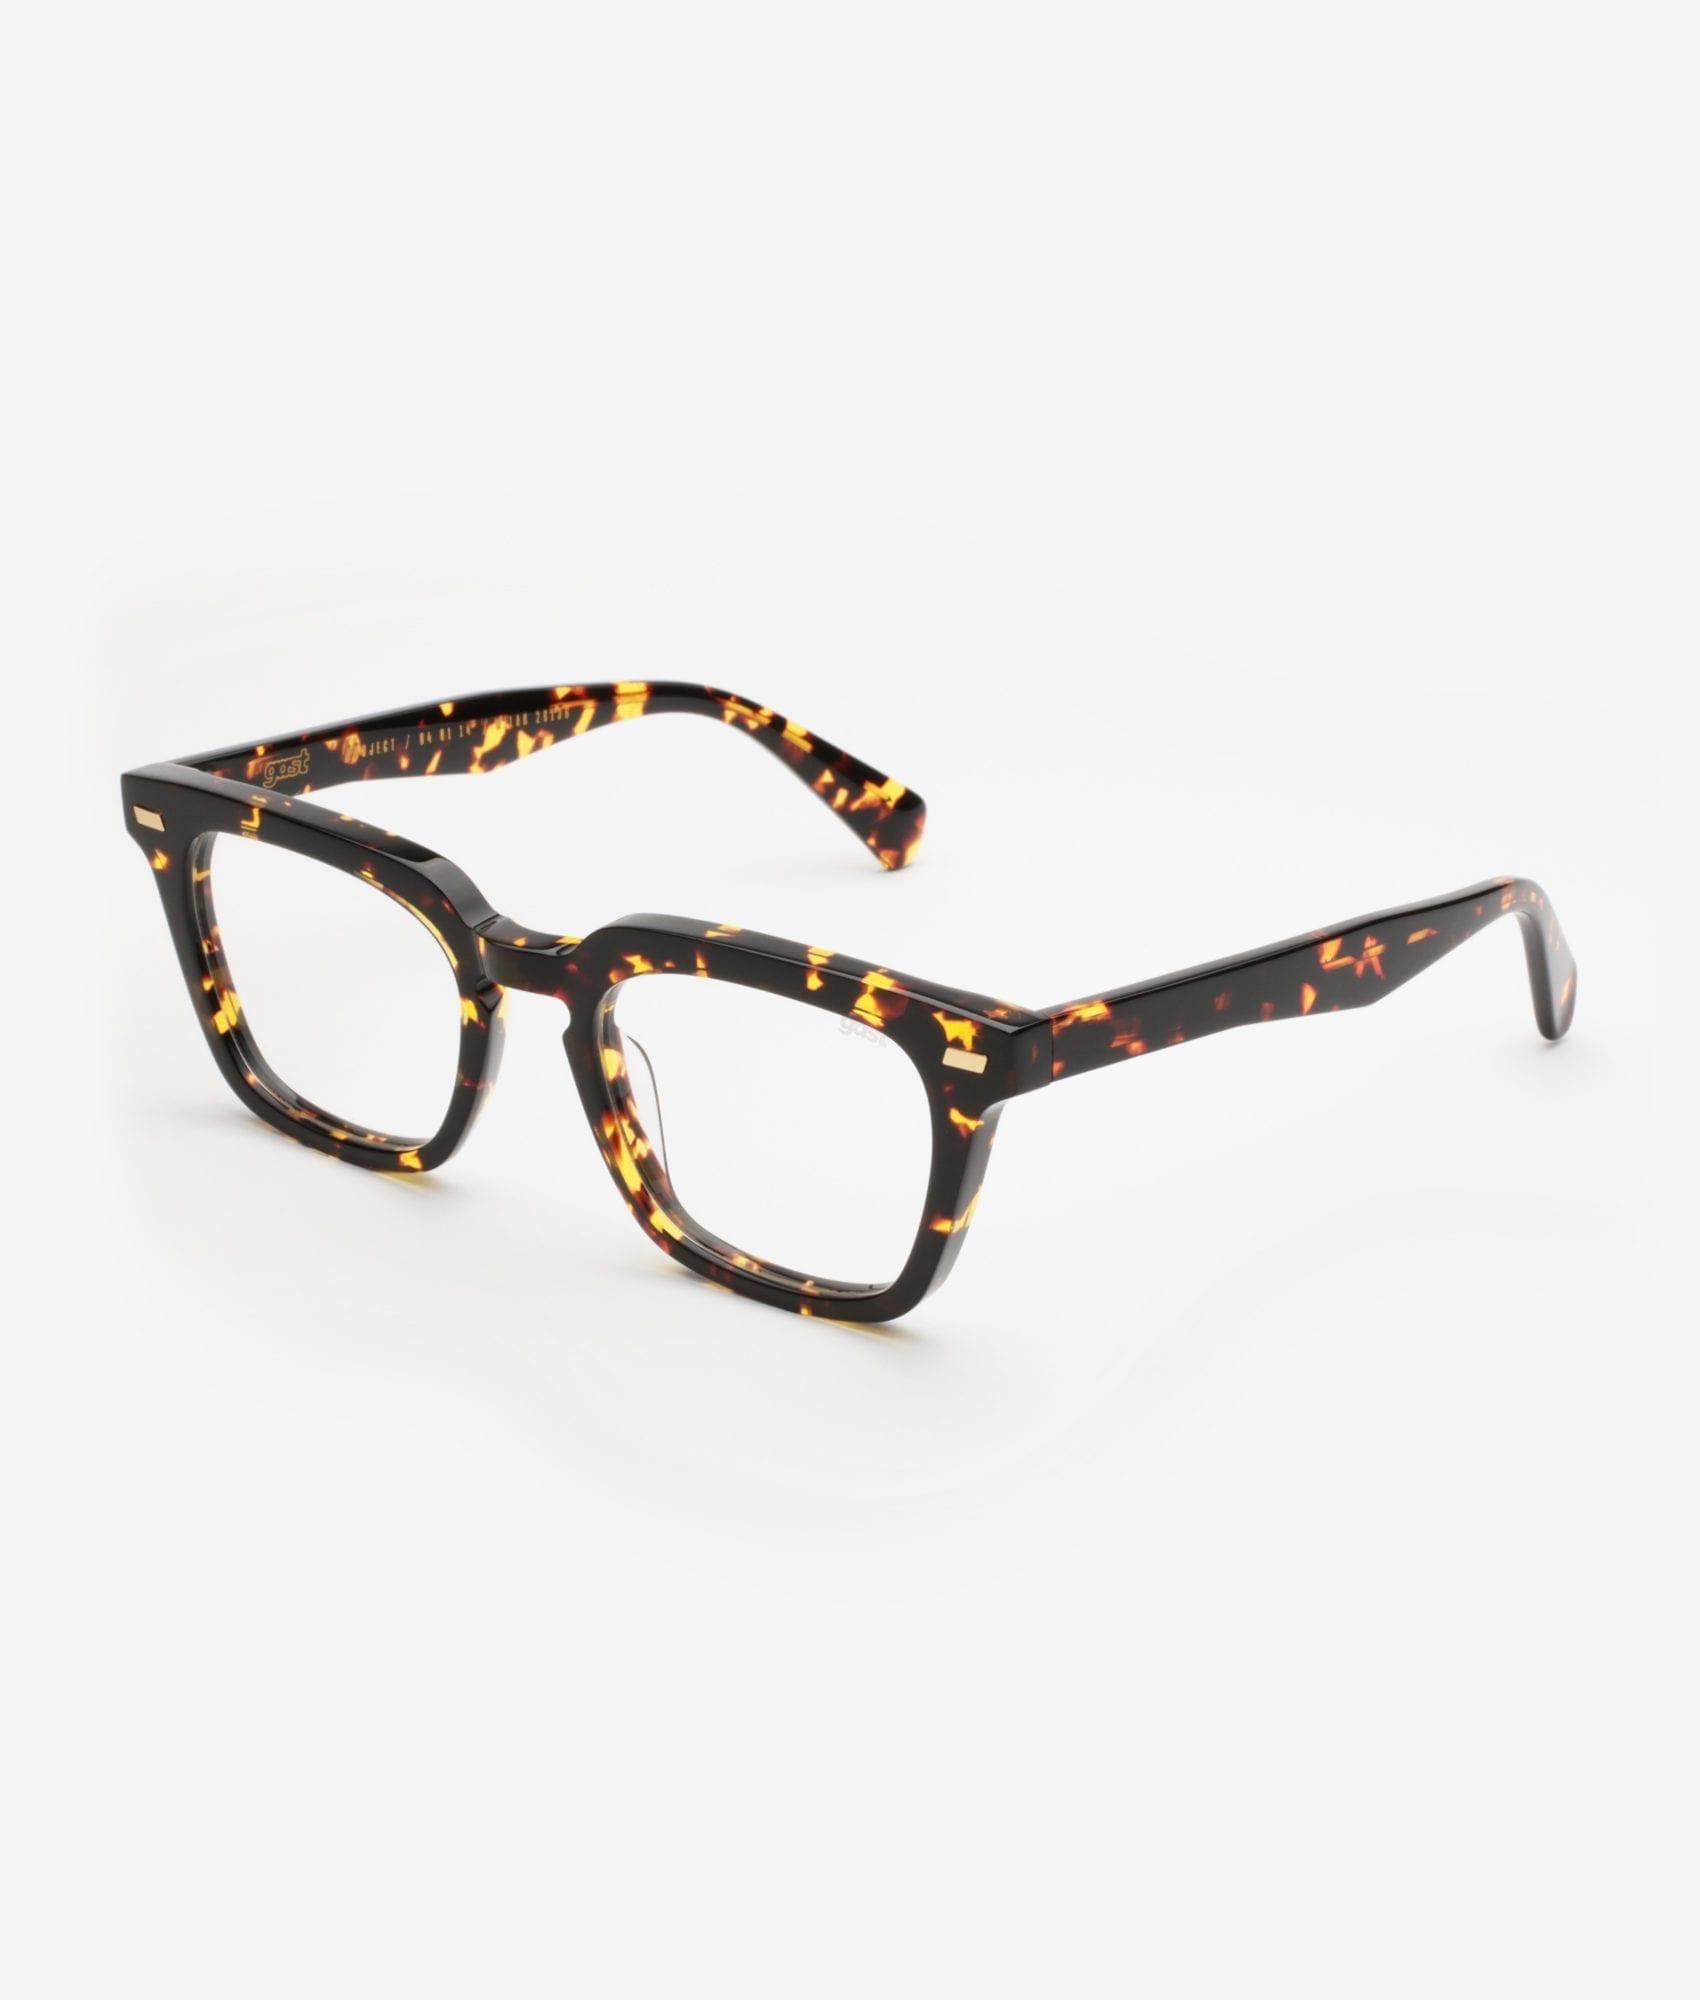 Ciacer Havana Flame Gast Eyewear